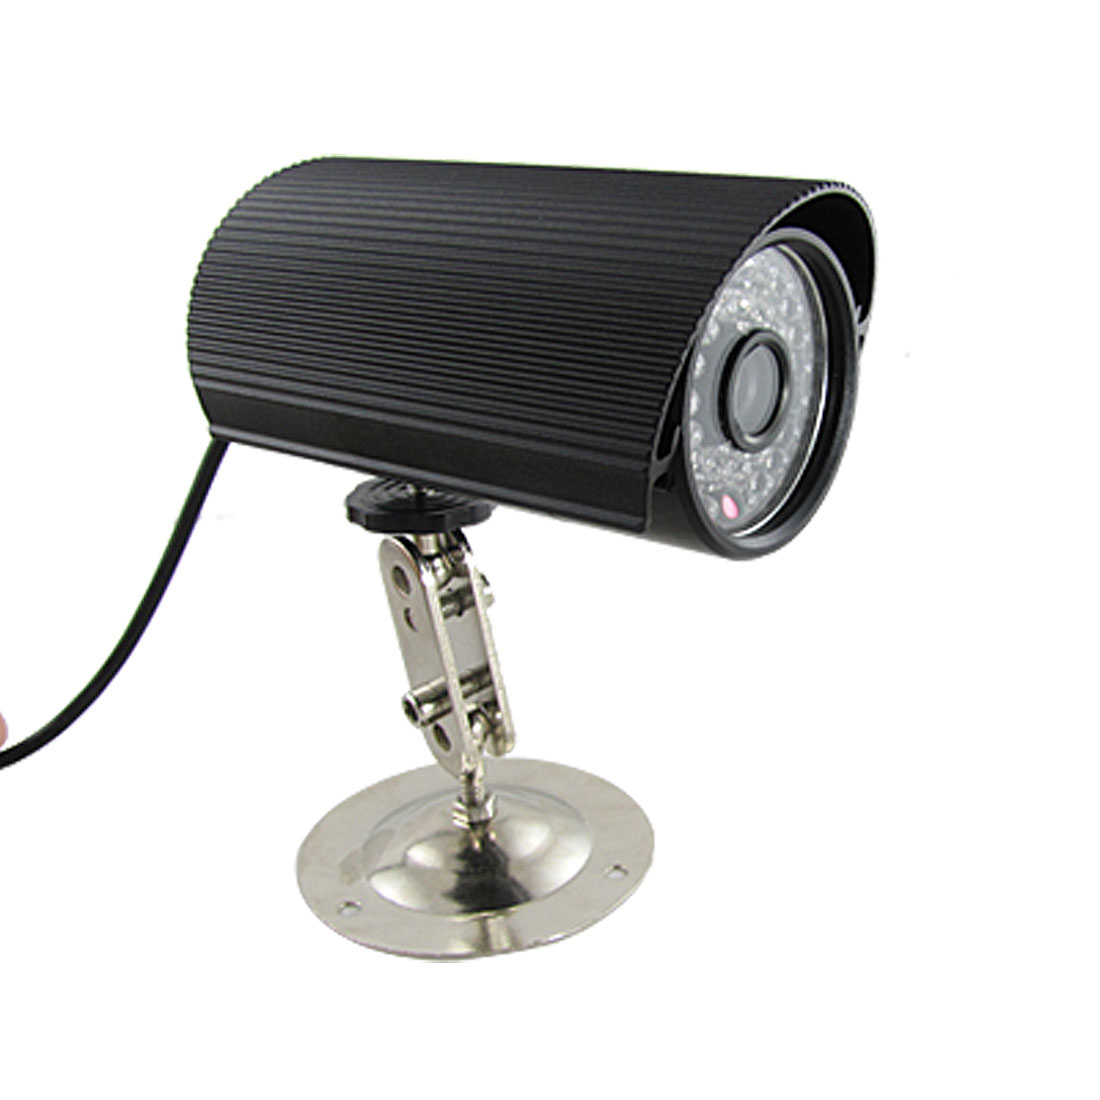 "PAL 420 TVL 37 LED 1/4"" CCD Color Infrared Camera Black"